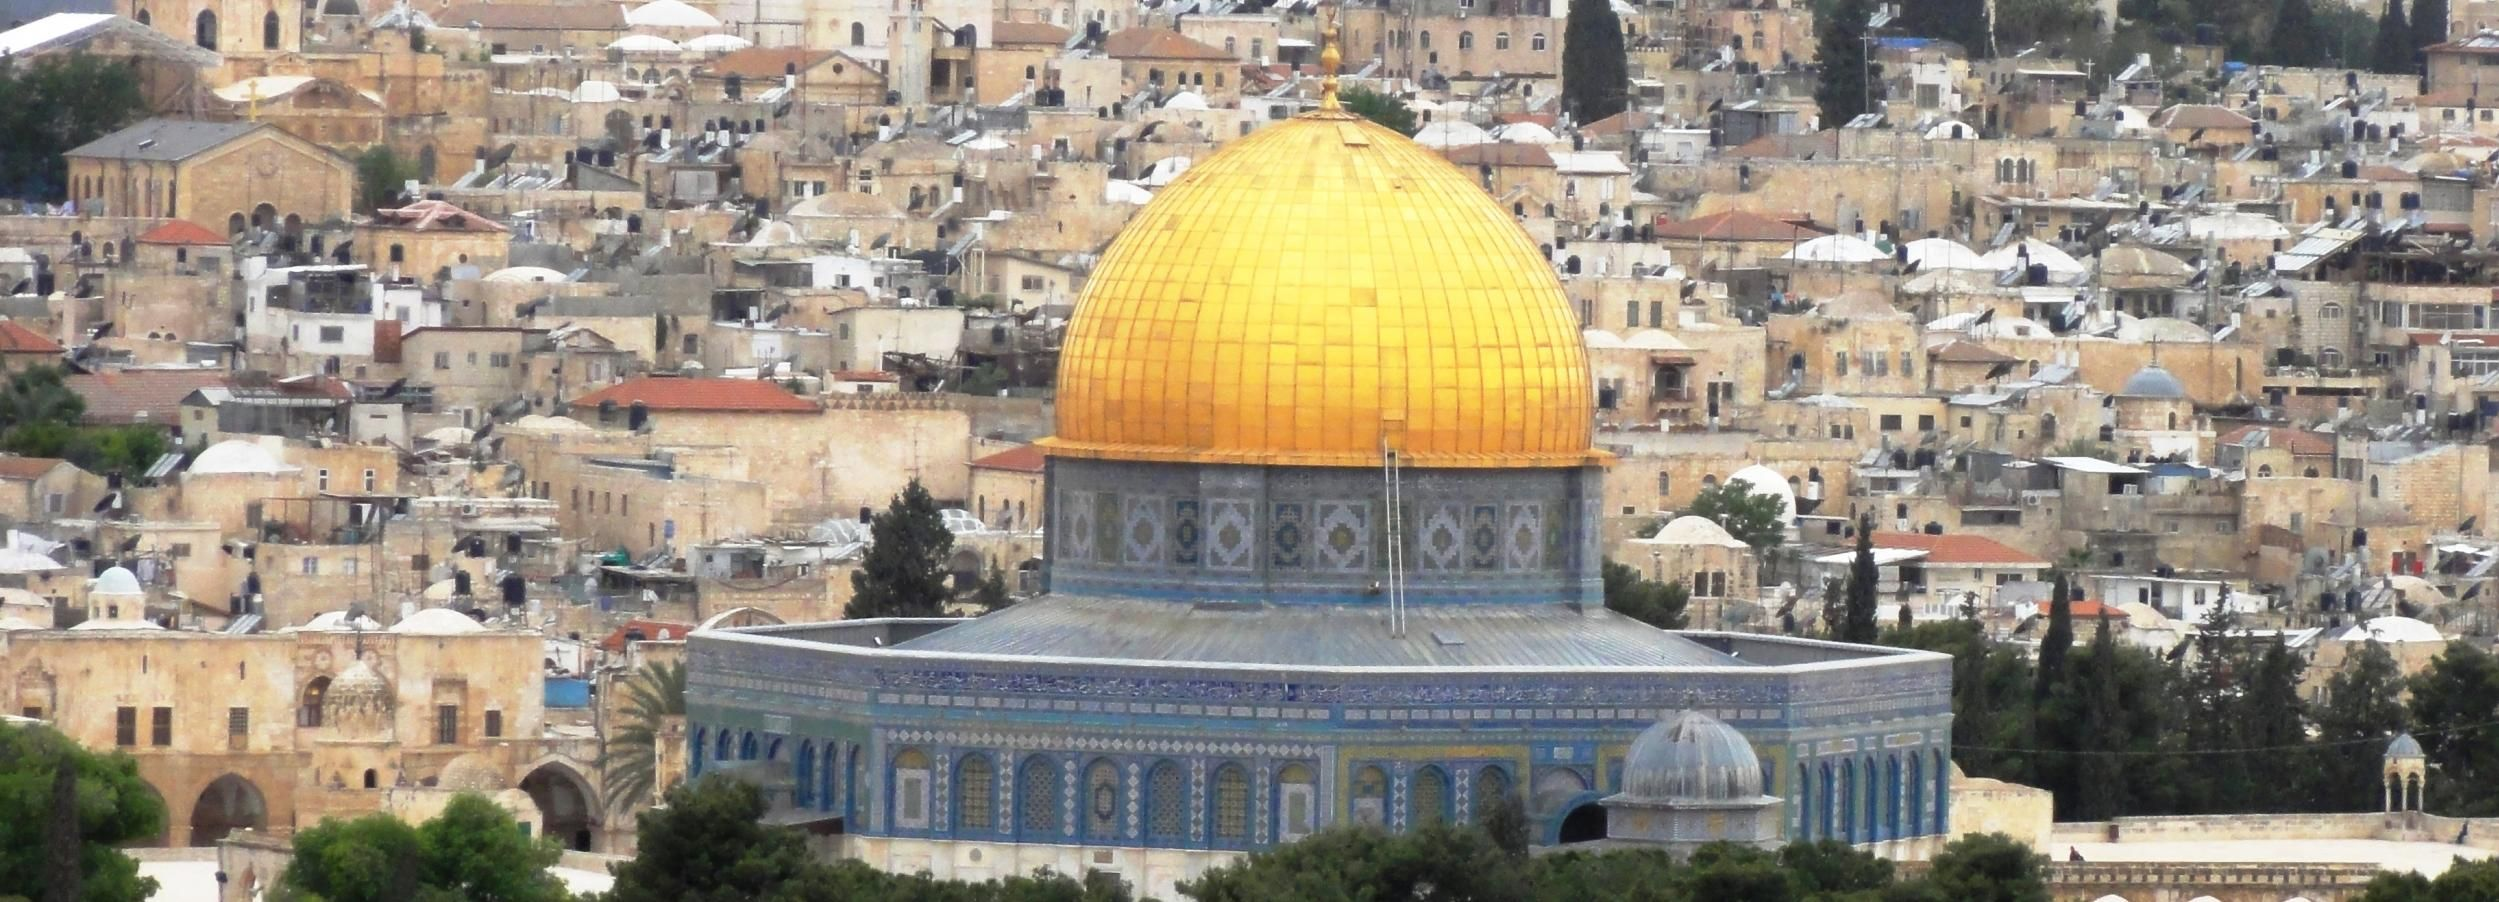 Tour privato di Gerusalemme, Betlemme e Mar Morto